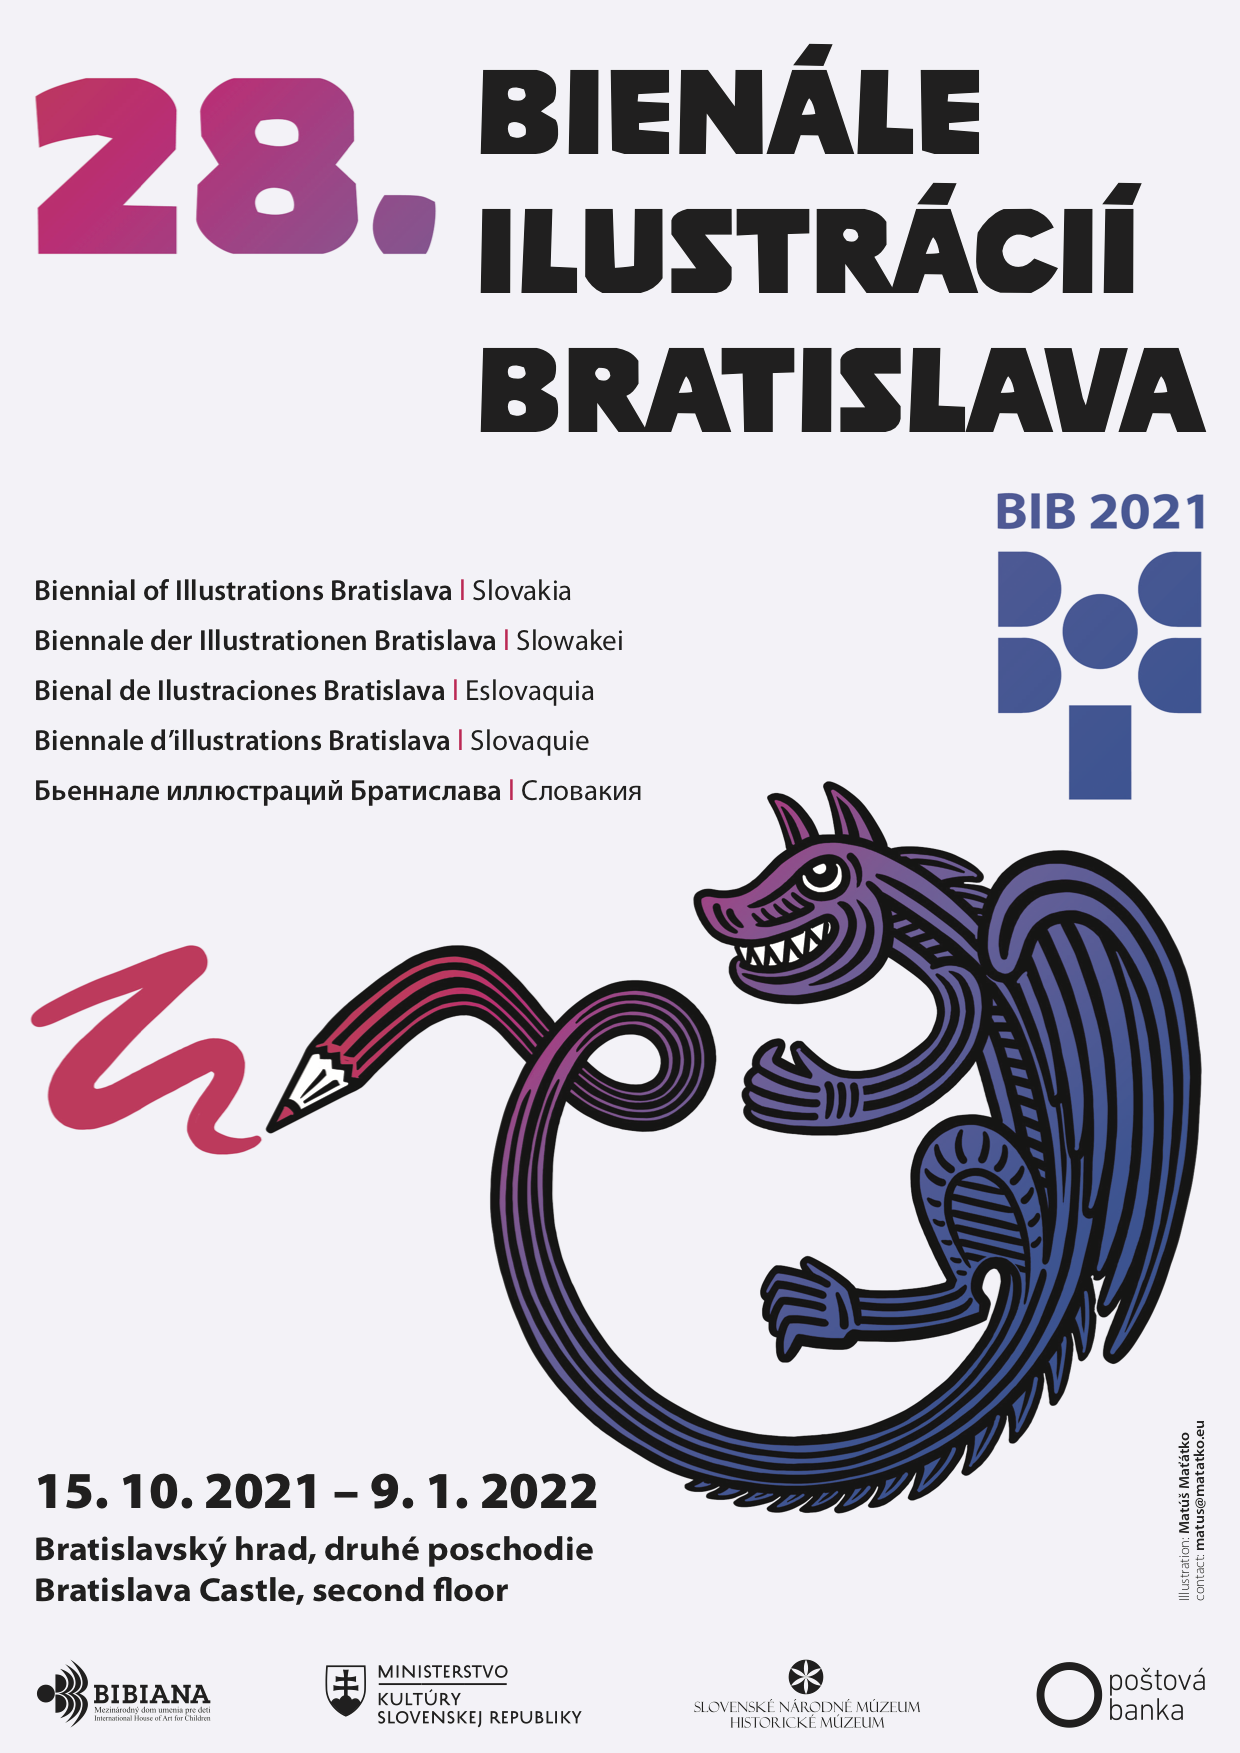 Bratislava Illustration Biennale